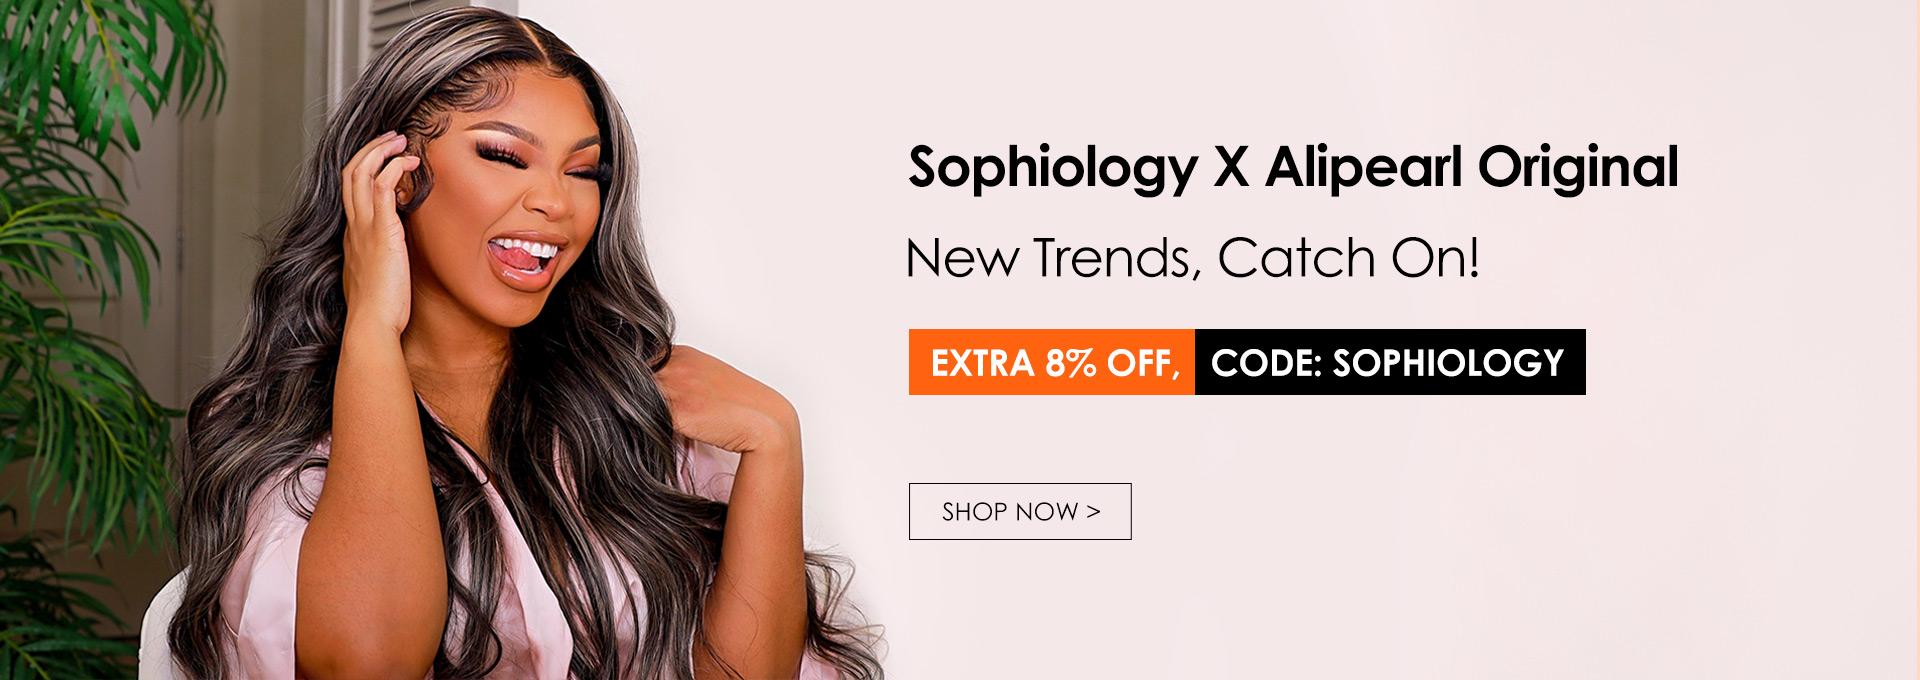 Sophiology X Alipearl Original Platinum Blonde Highlights Wigs